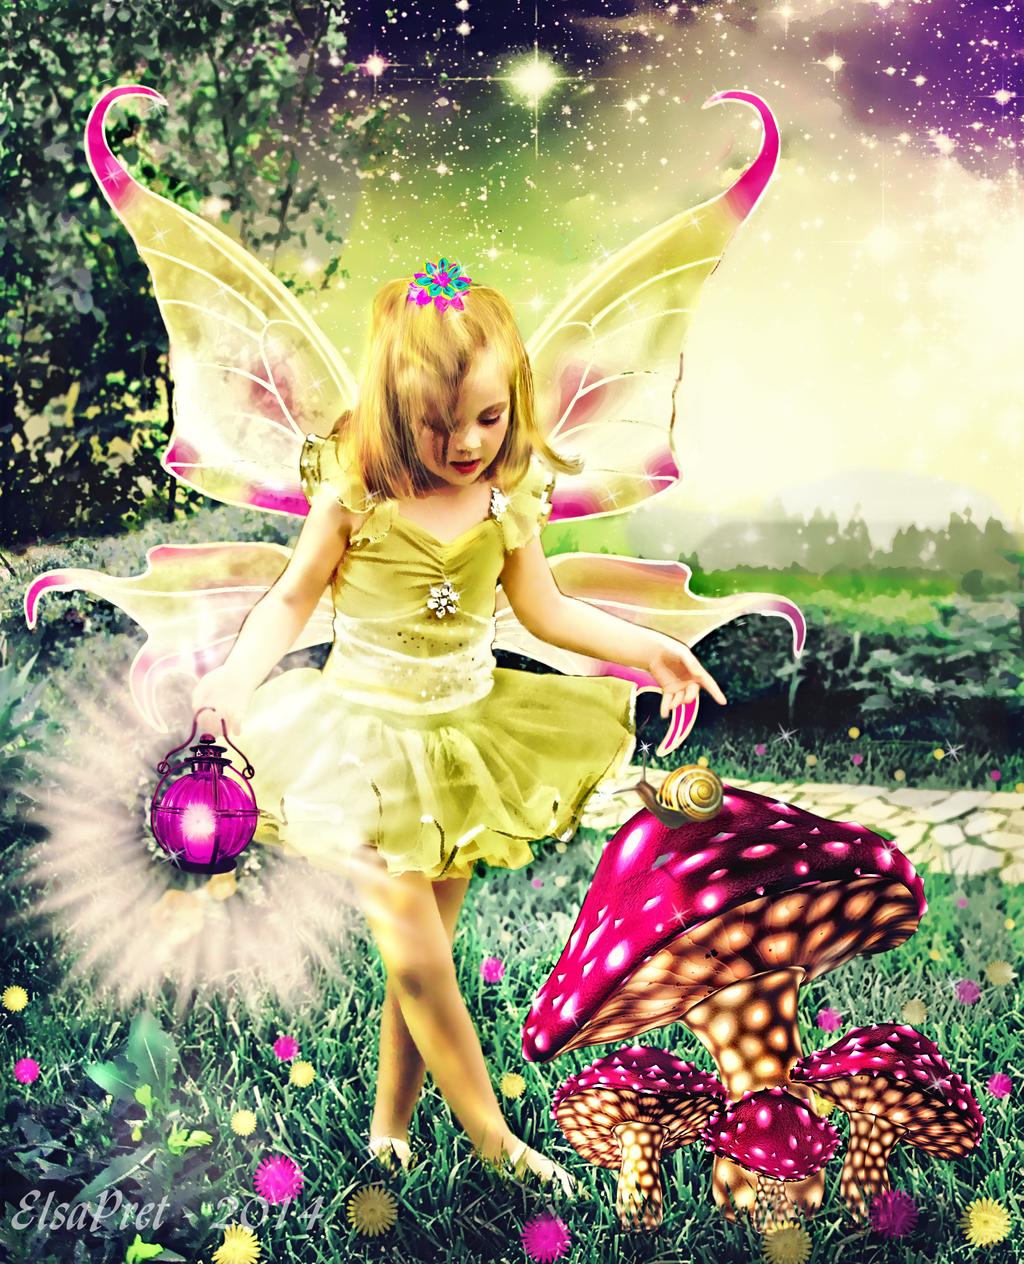 Spring magic@midnight by Elsapret